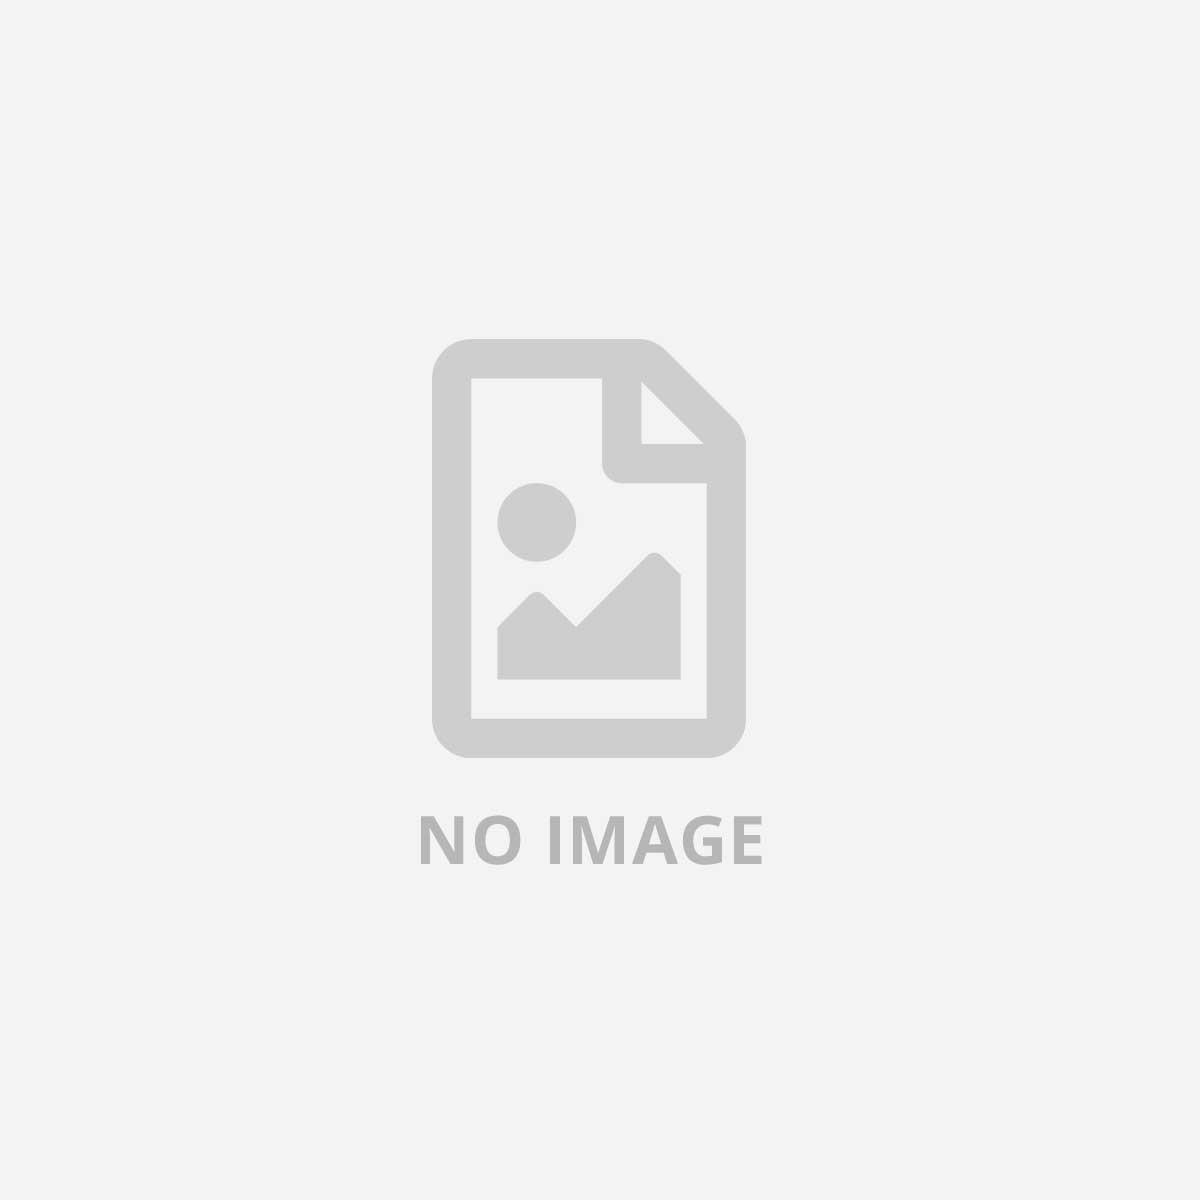 AEROHIVE NETWORKS WMONTG  15/16  CELNG MNT BRCKTAP122